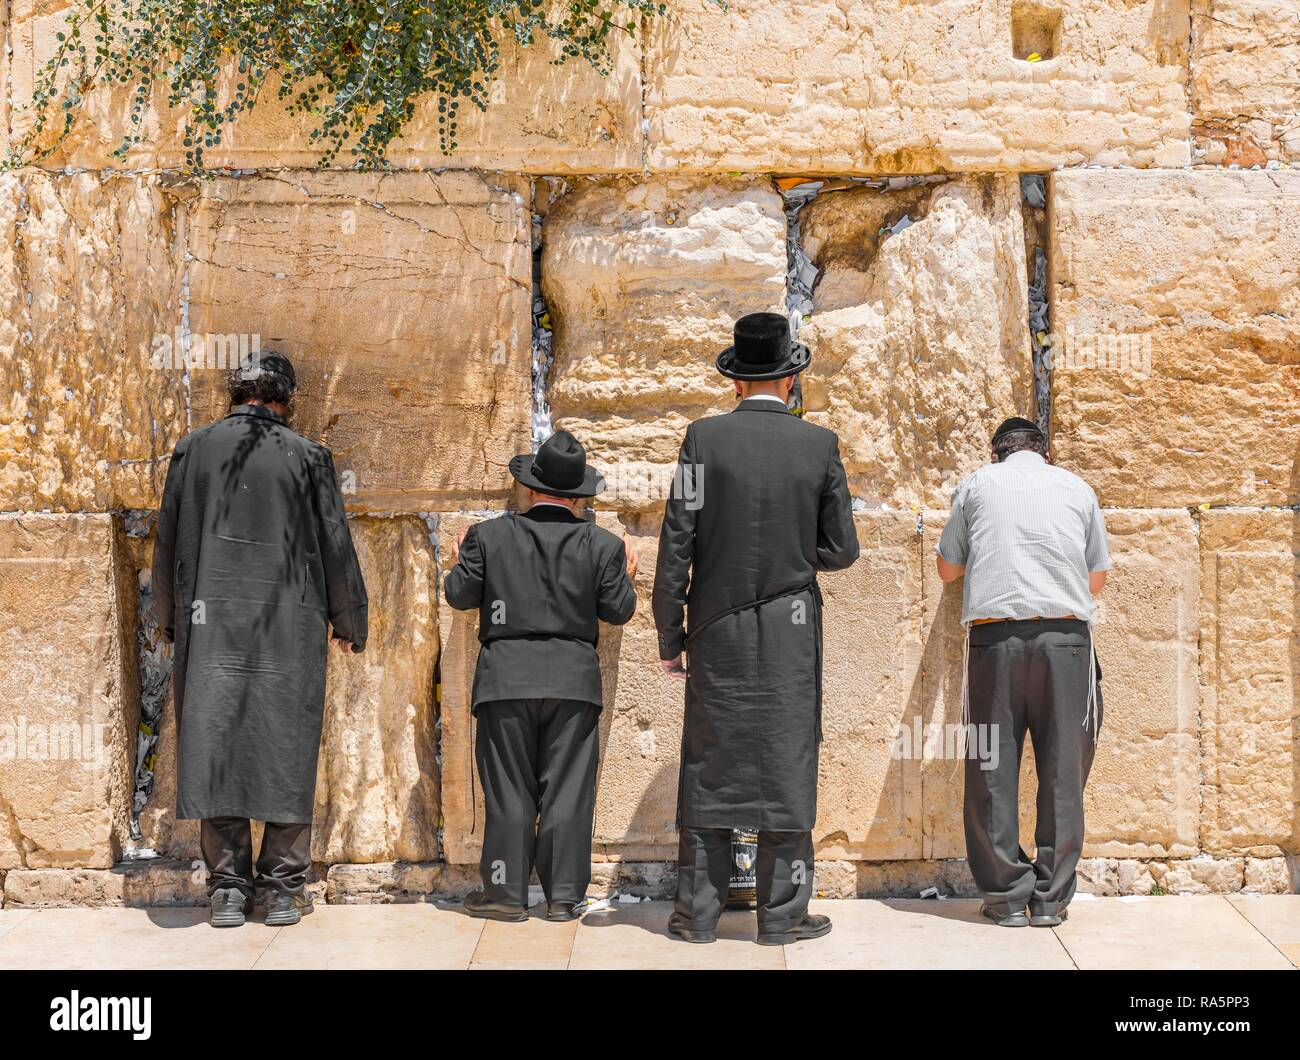 Praying Orthodox Jews at the Wailing Wall, Jerusalem, Israel